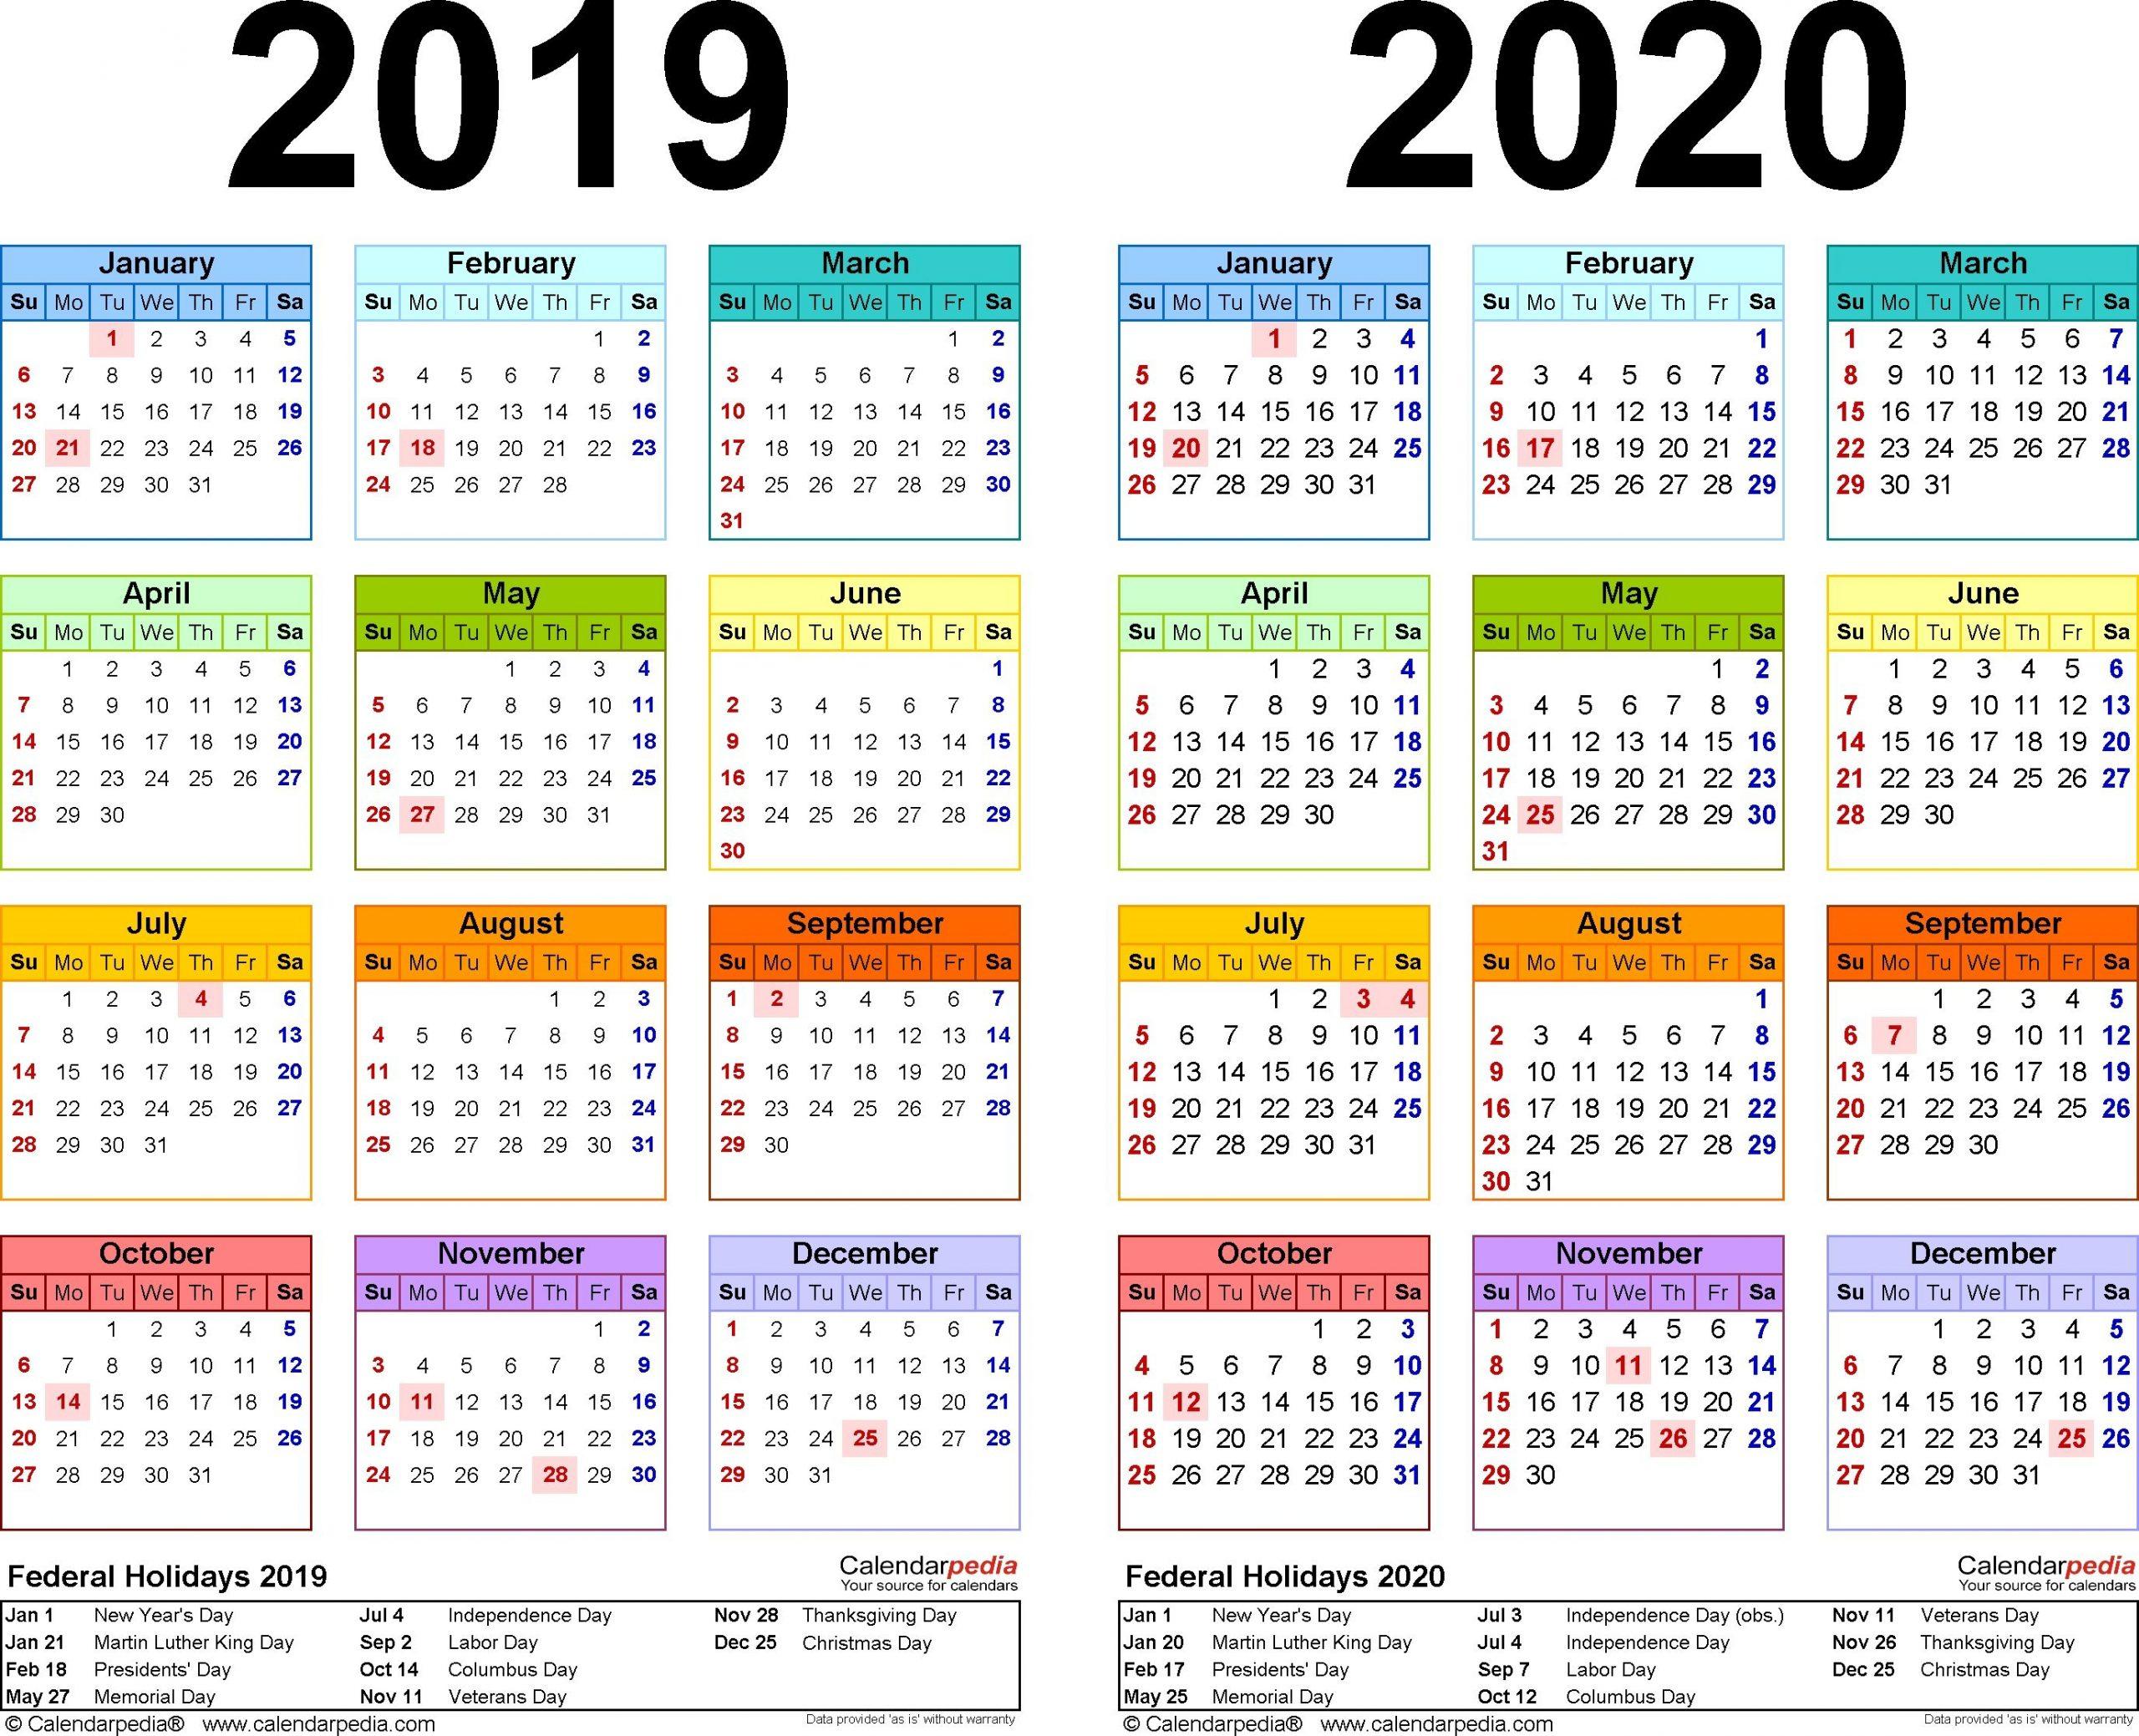 2019-2020 Calendar - Free Printable Two-Year Pdf Calendars